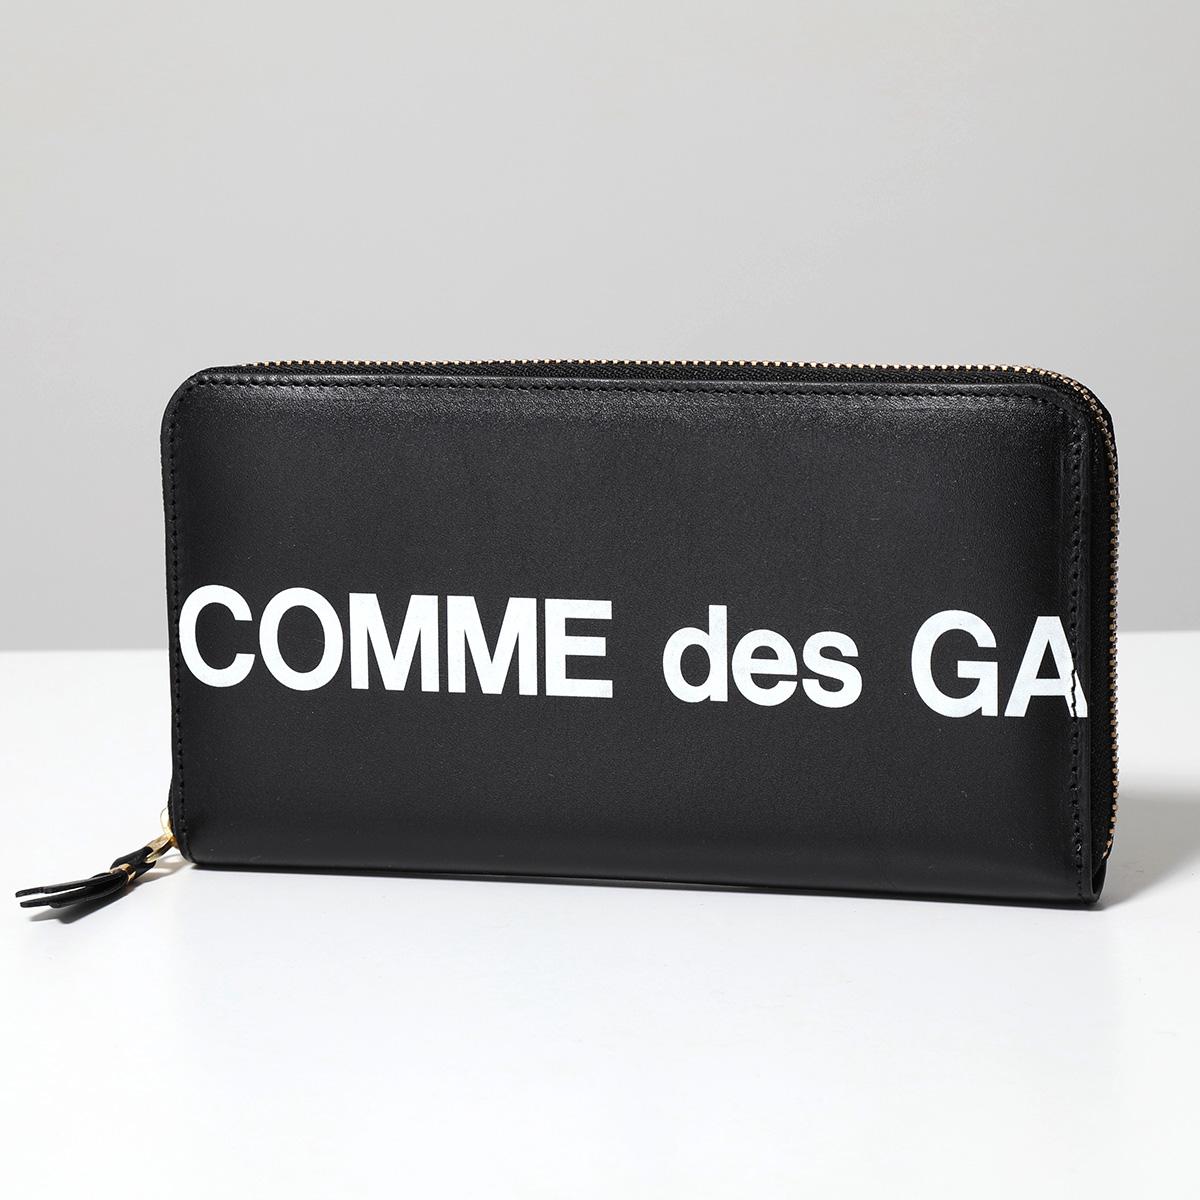 COMME des GARCONS コムデギャルソン SA0111HL HUGE LOGO レザー ラウンドファスナー 長財布 BLACK メンズ